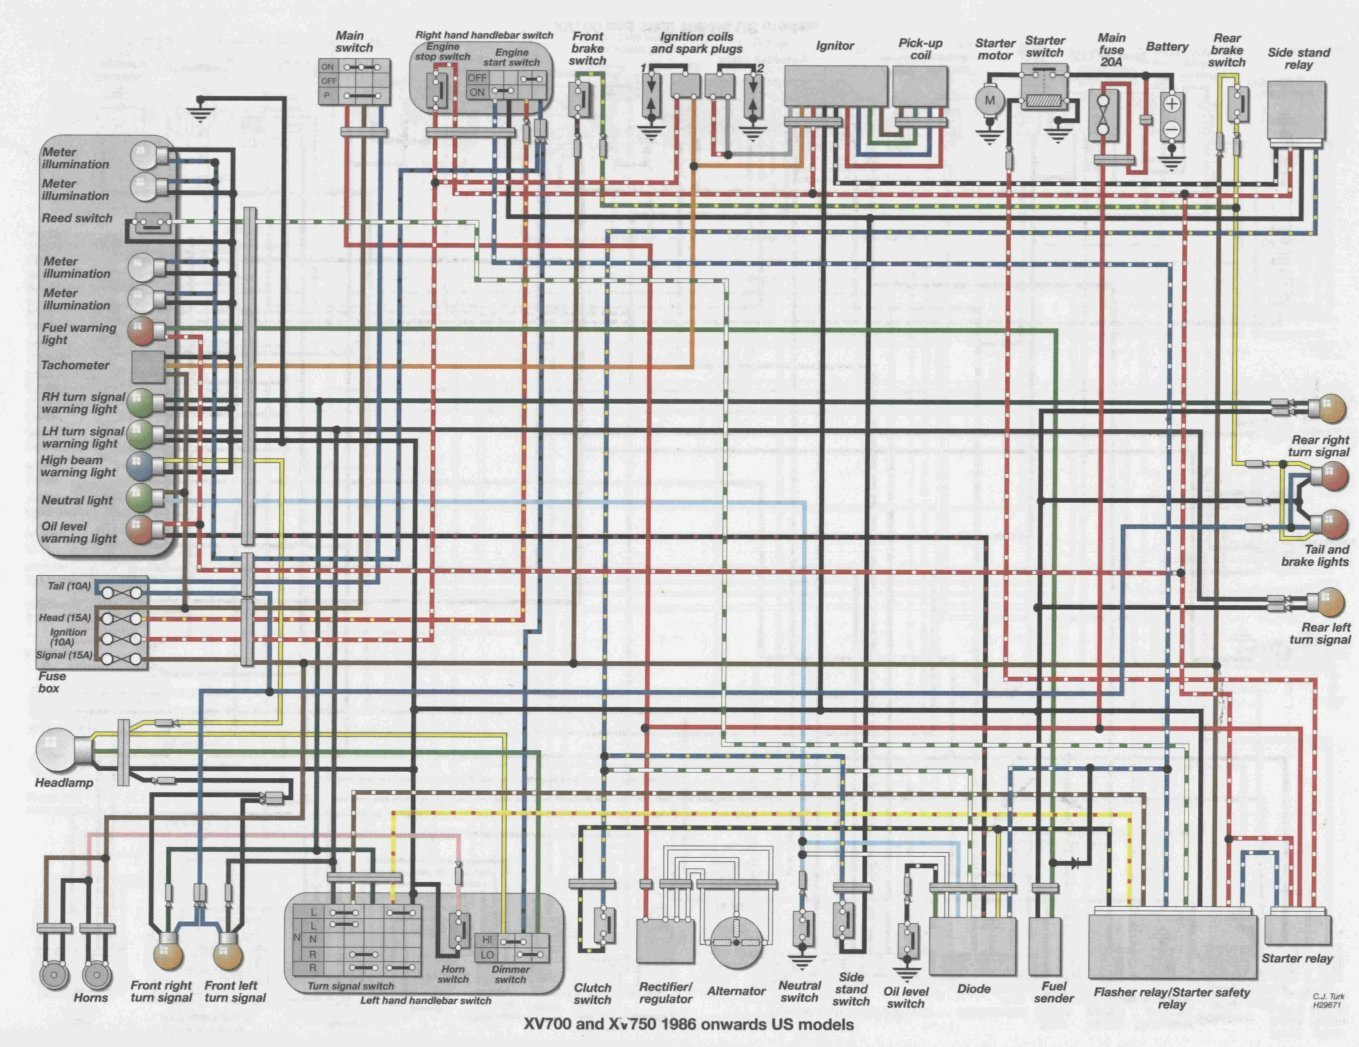 Diagram 82 1100 Yamaha Maxim Wiring Diagram Full Version Hd Quality Wiring Diagram Wiringklang2f Atuttasosta It